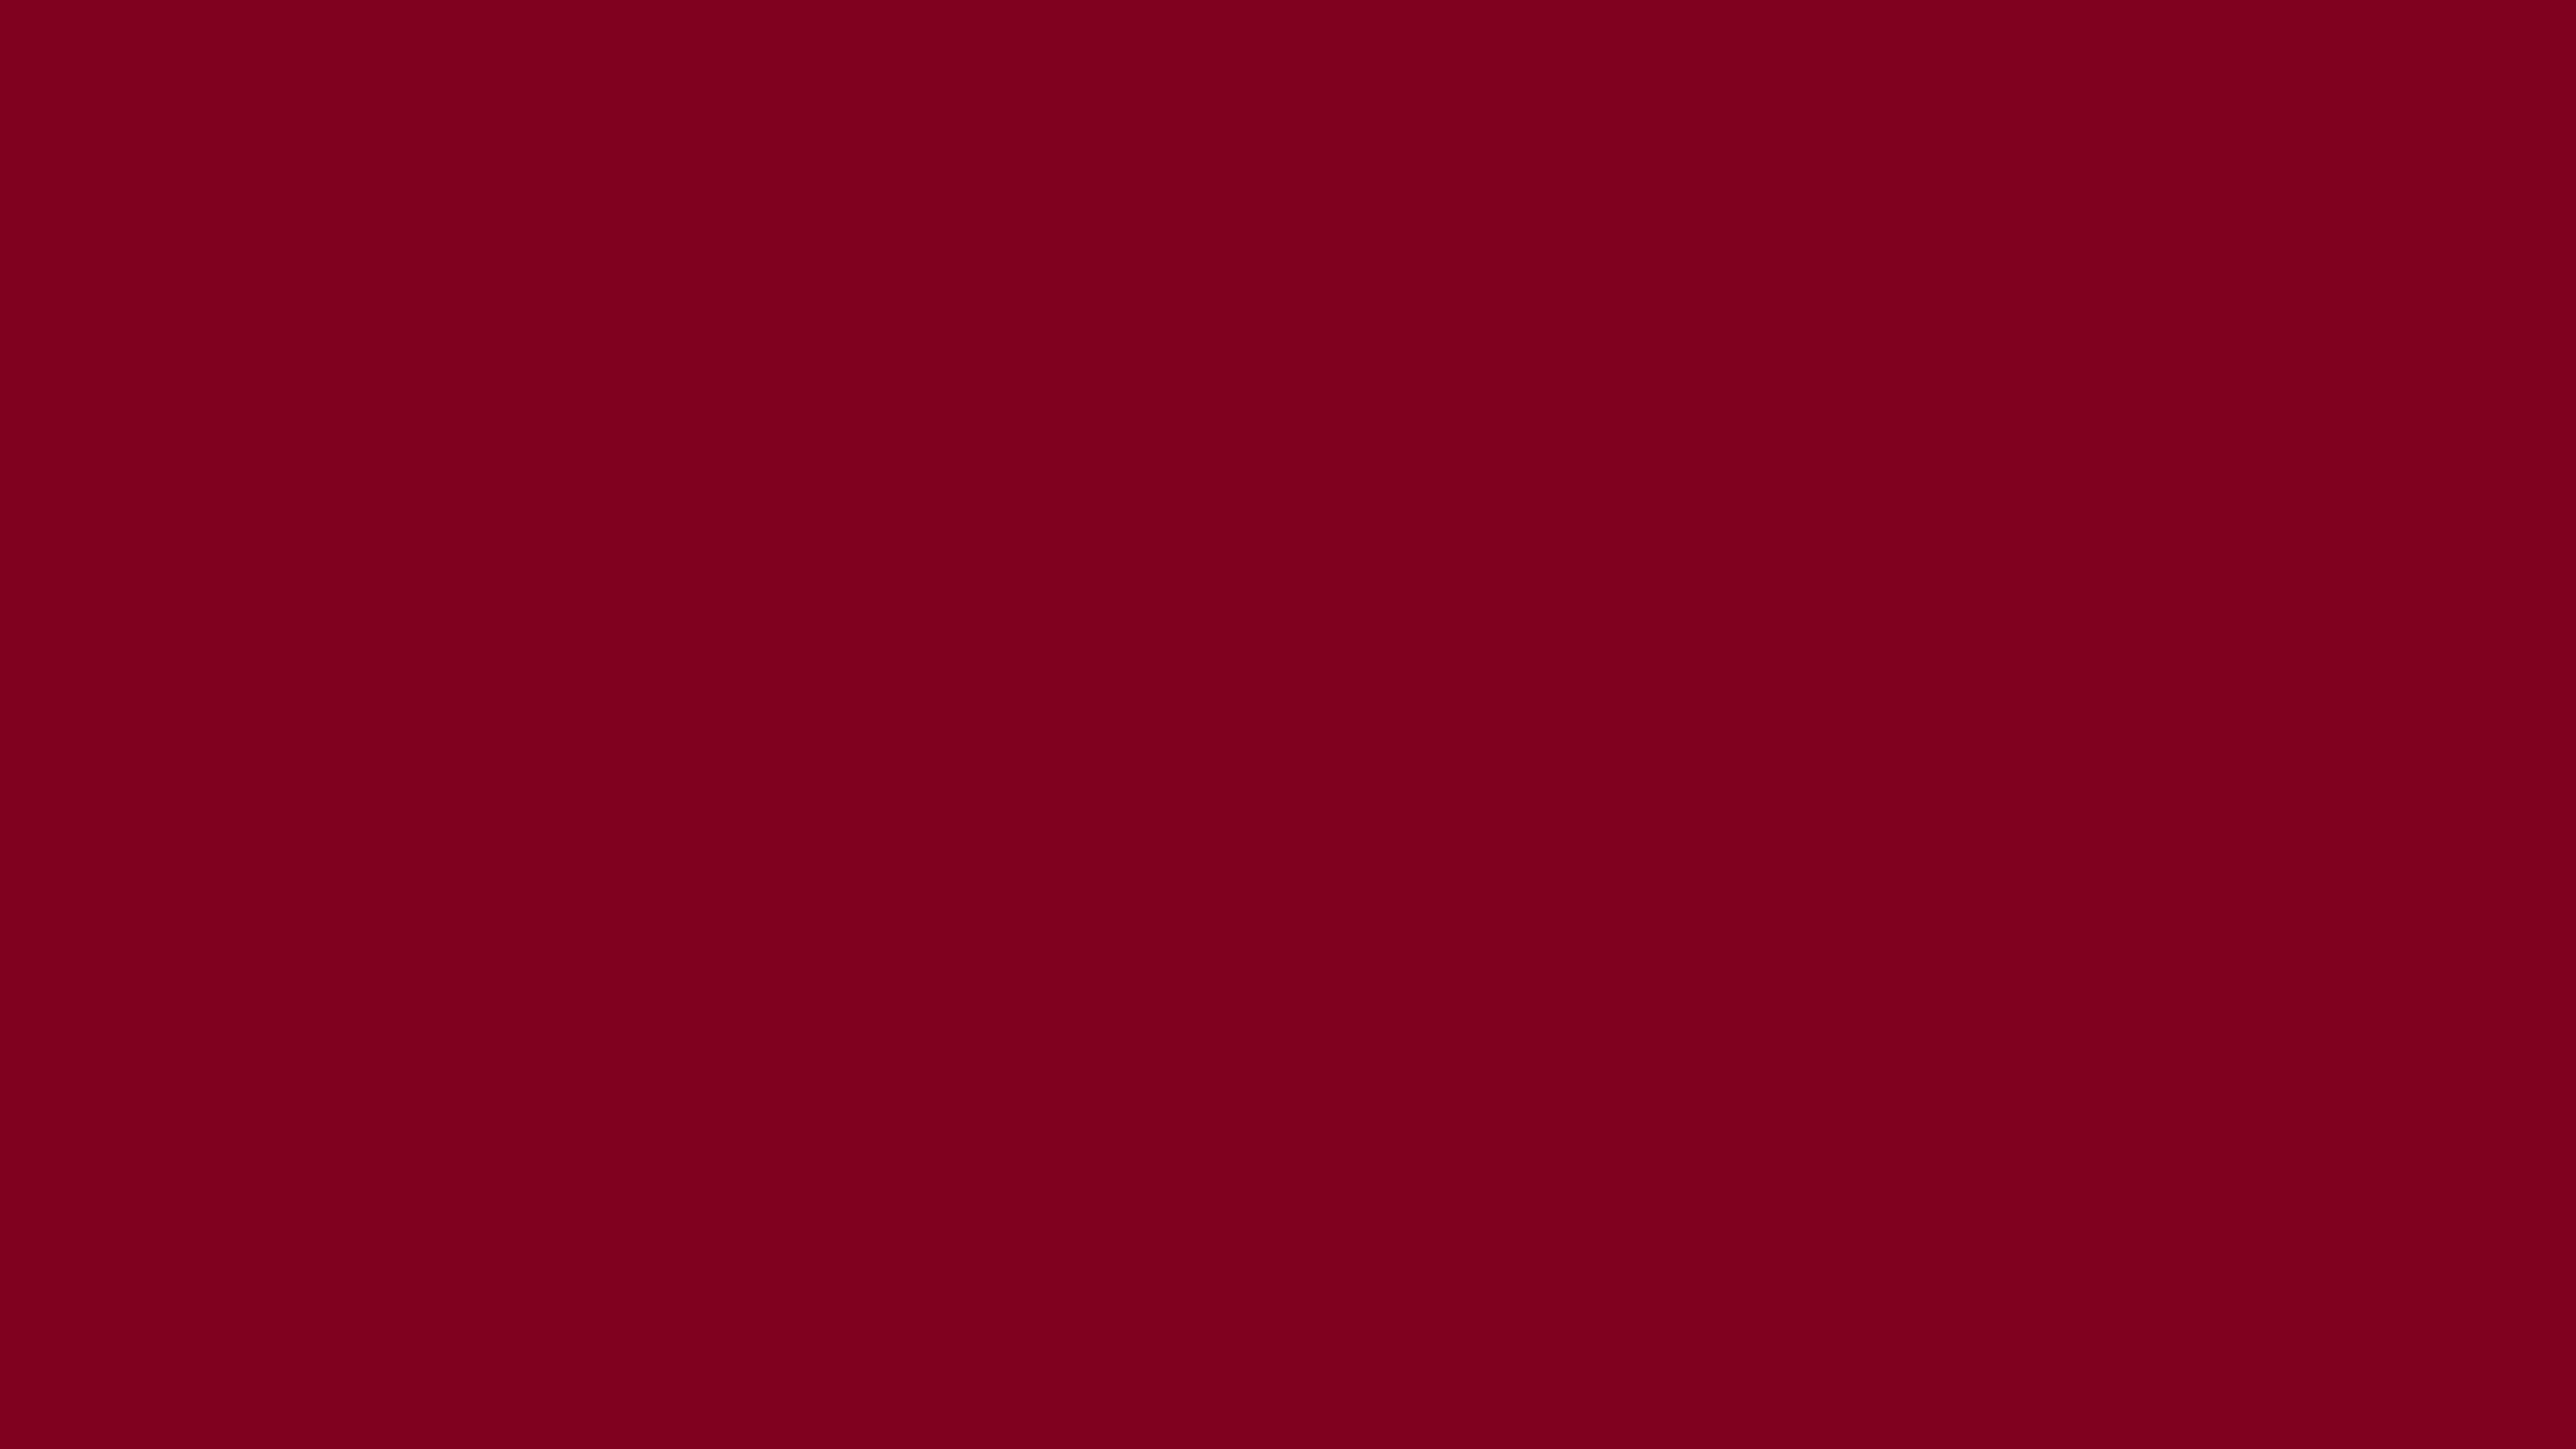 3840x2160 burgundy solid color background 3840x2160 burgundy solid color background